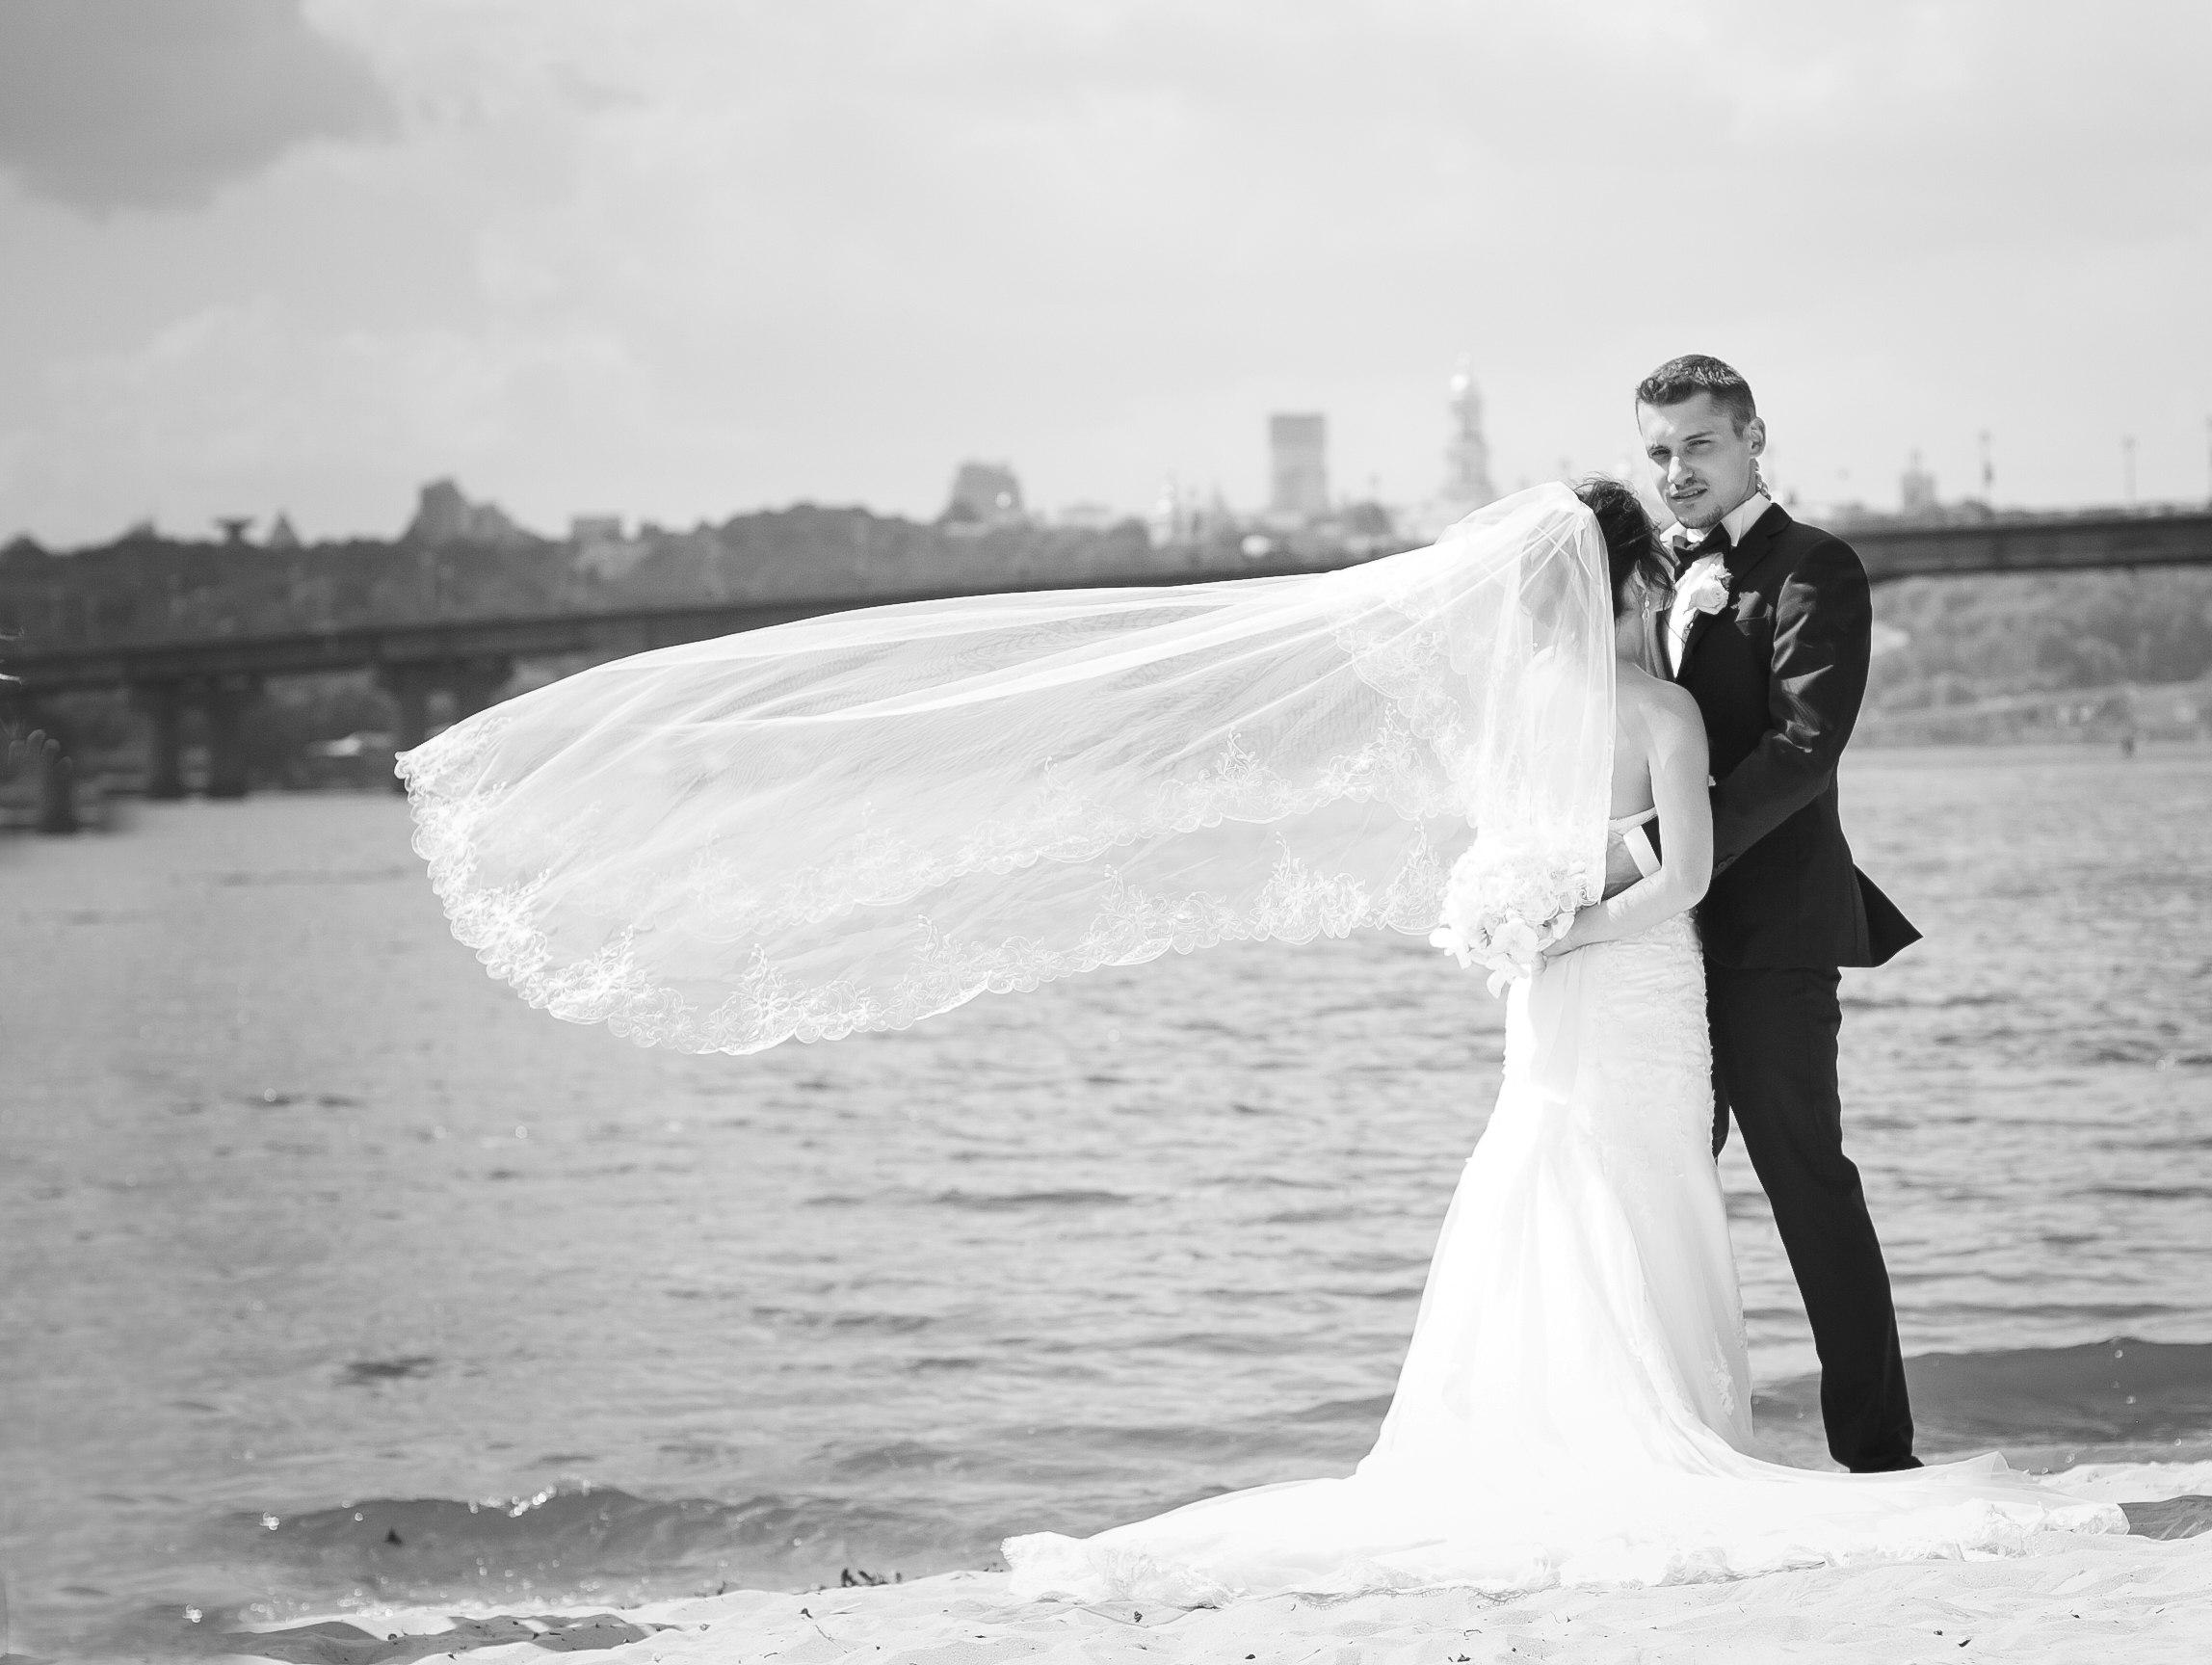 MJlukLzp z8 - Готовимся к свадьбе: праздник своими руками